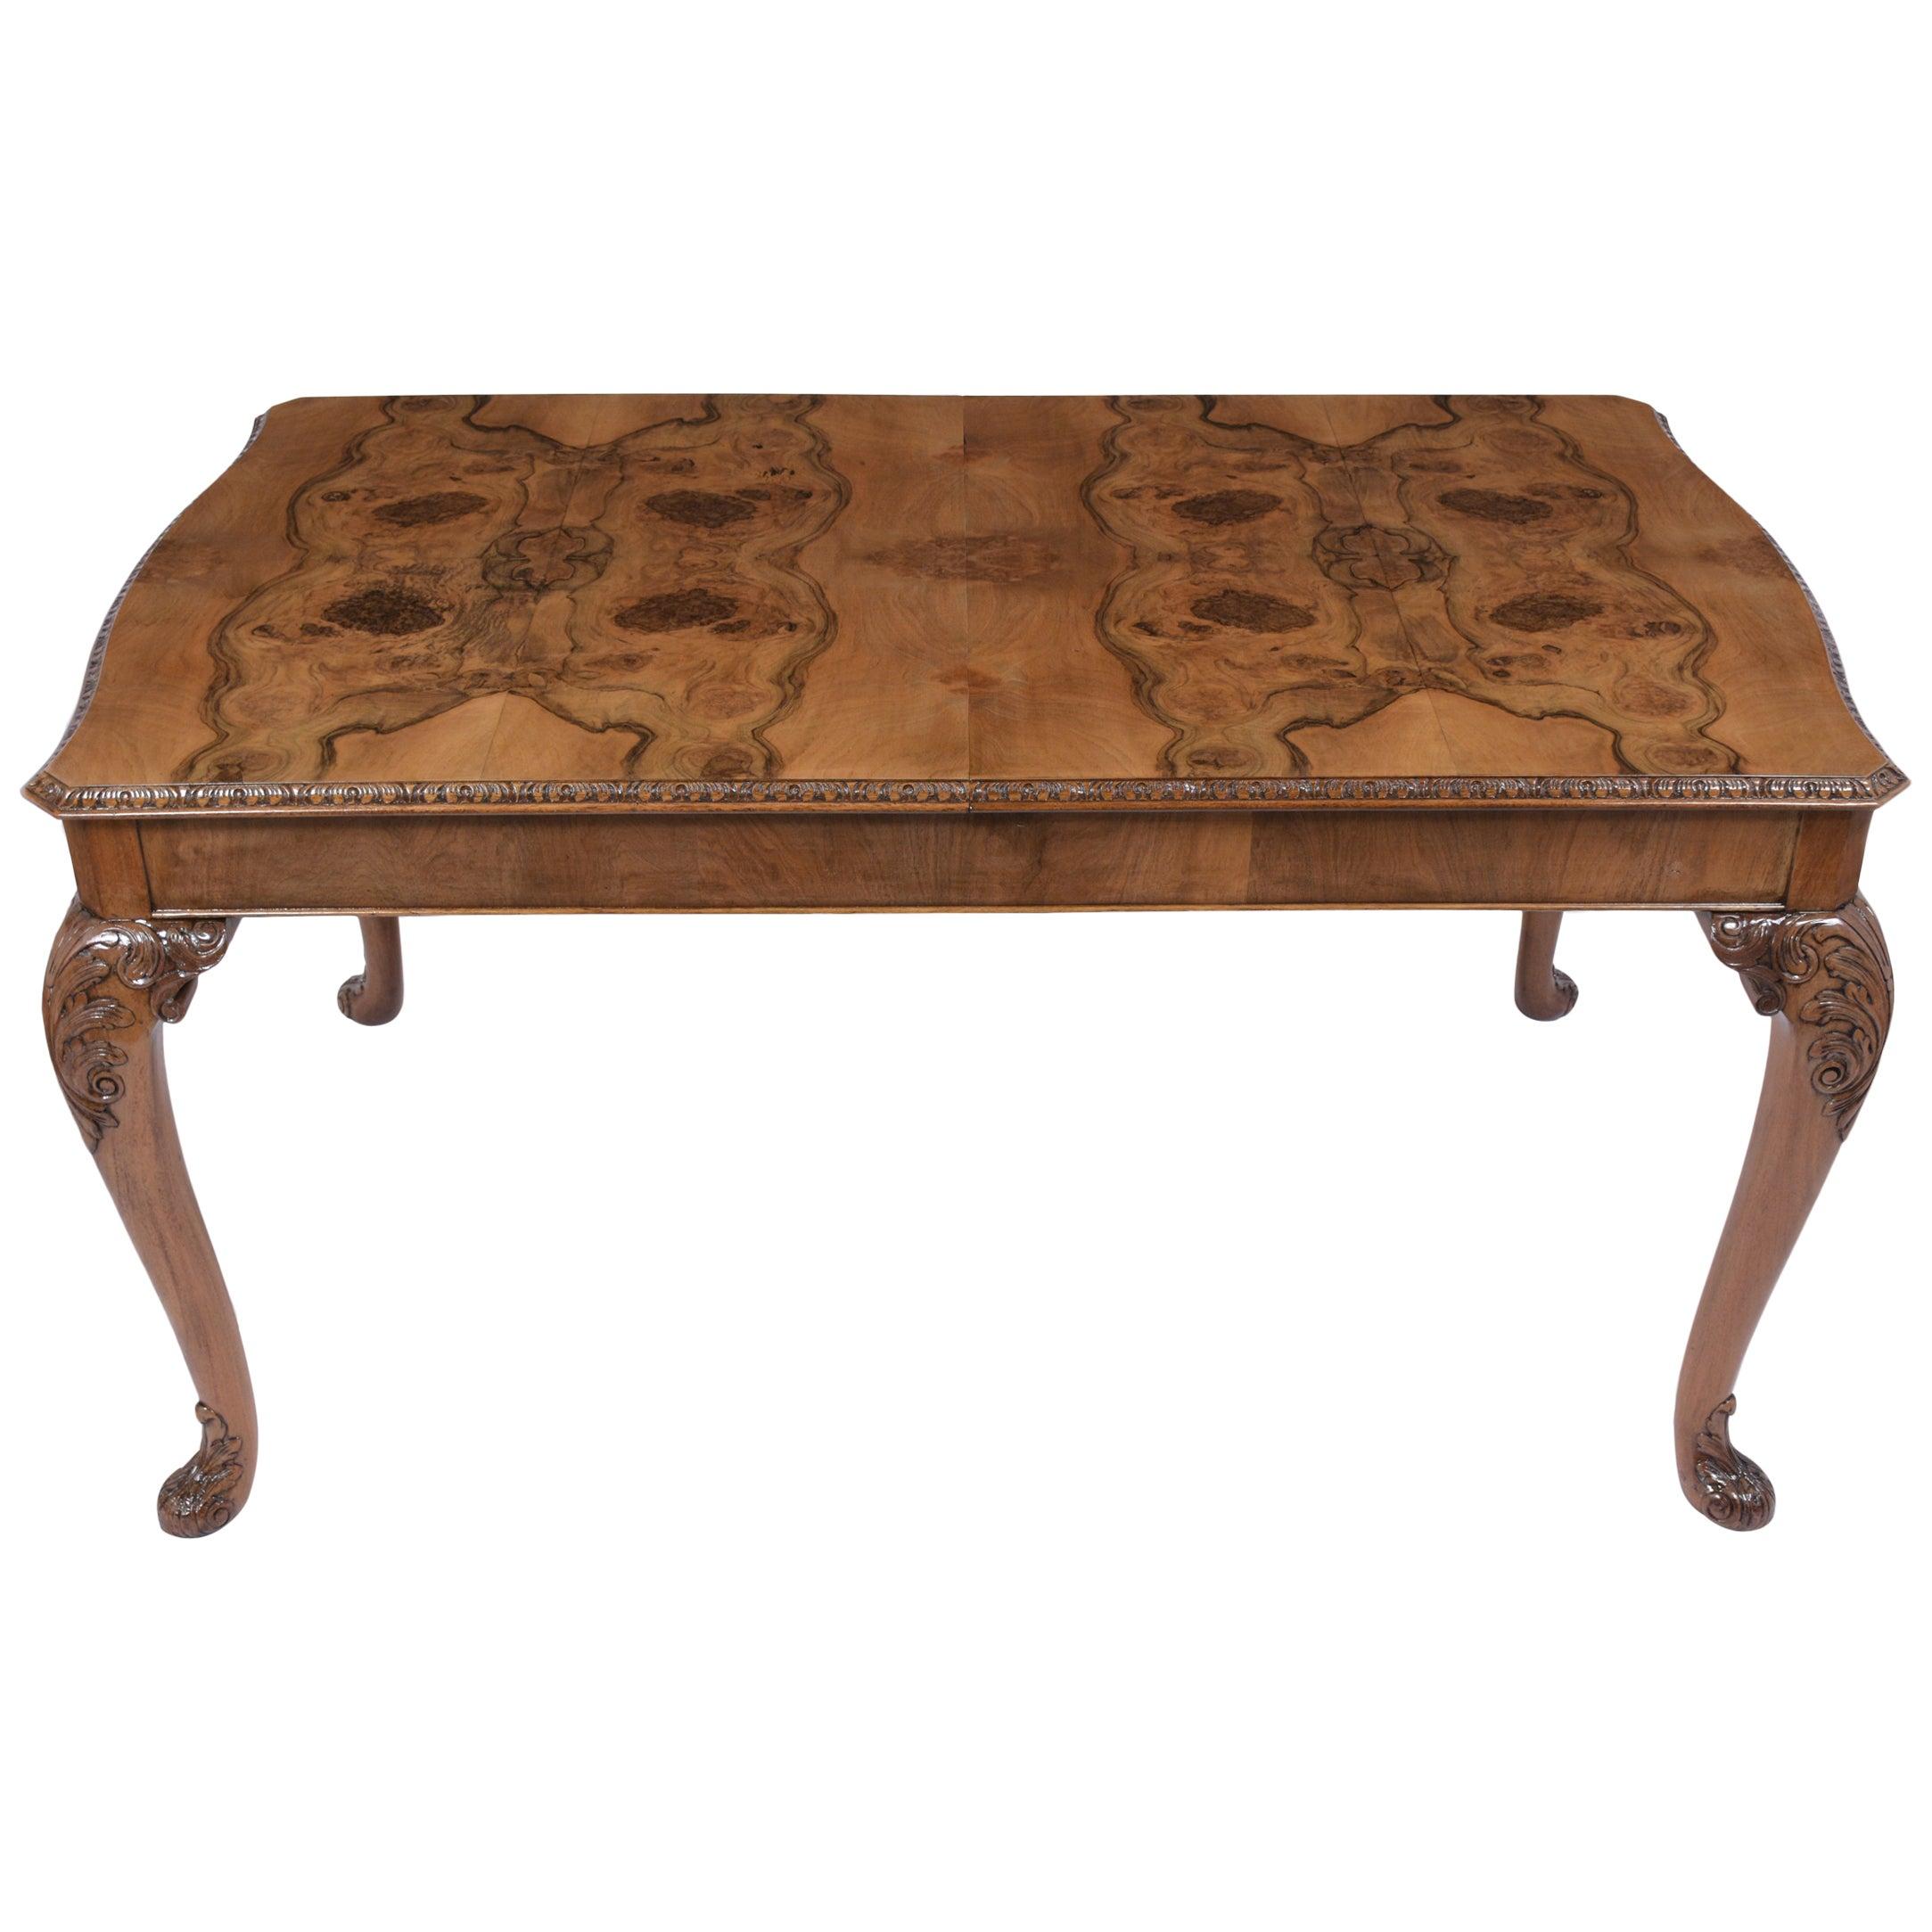 Antique English Walnut Dining Table